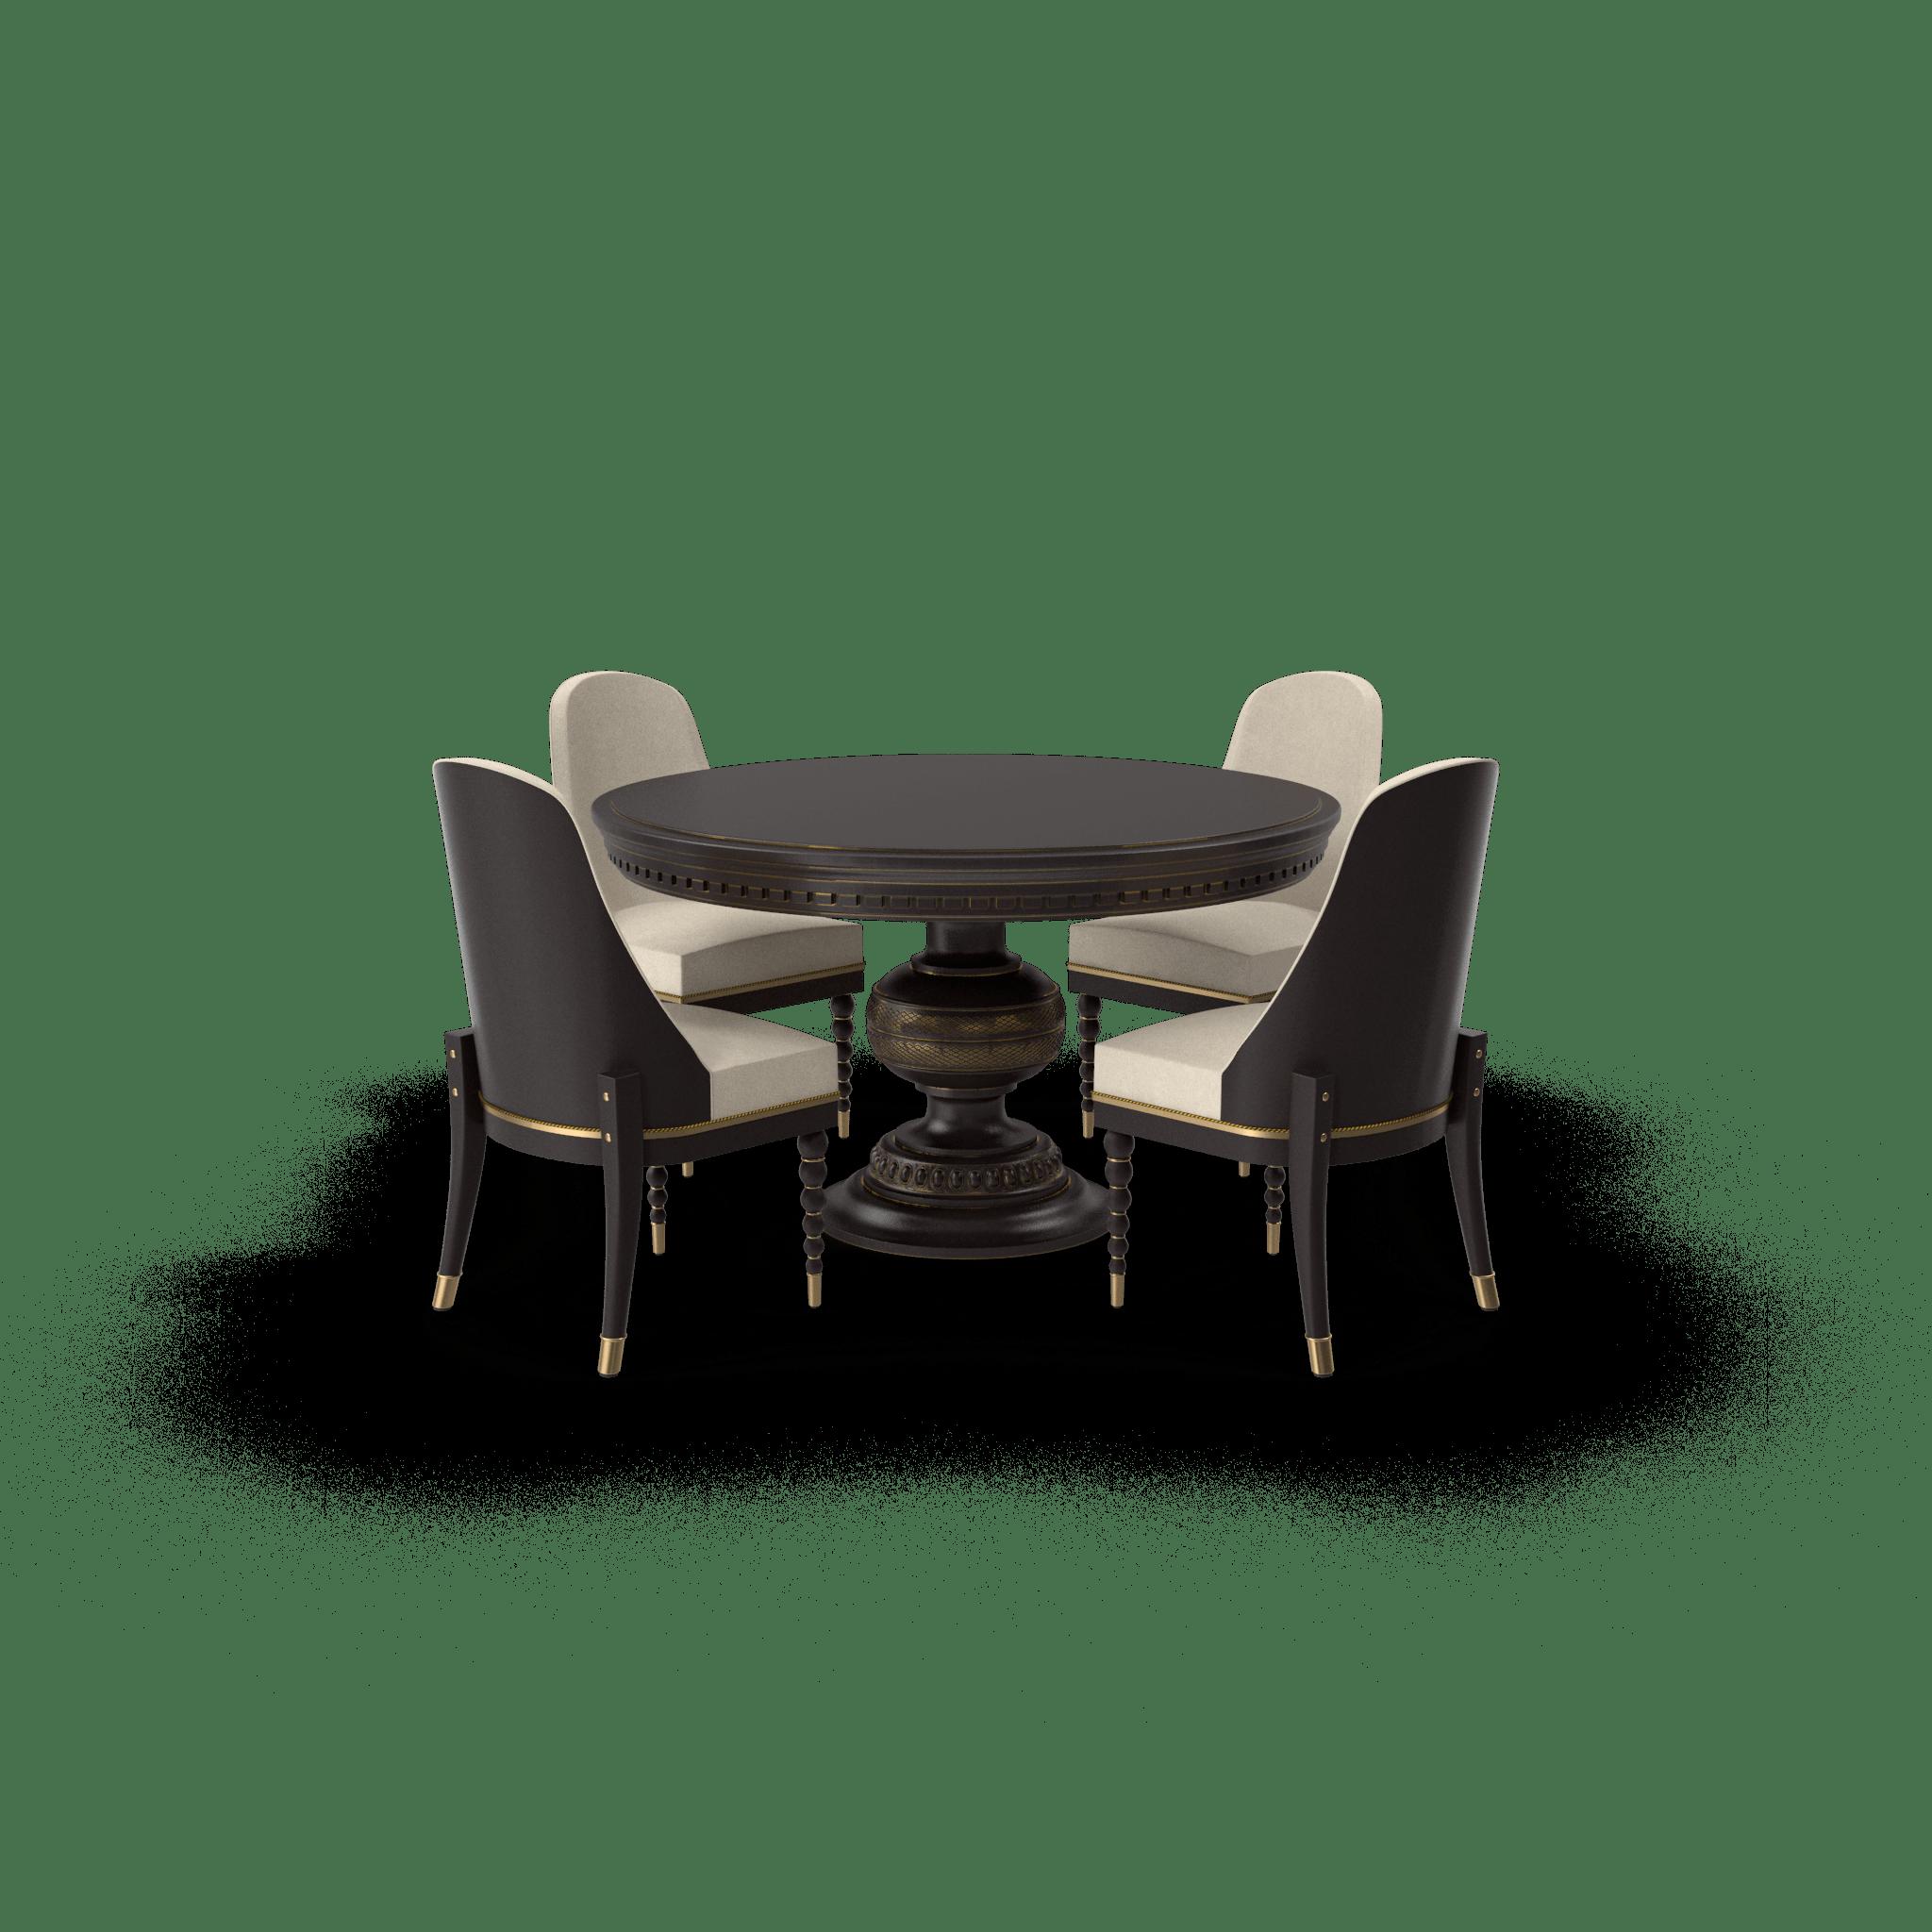 Round Dining Table Set.H03.2k-min